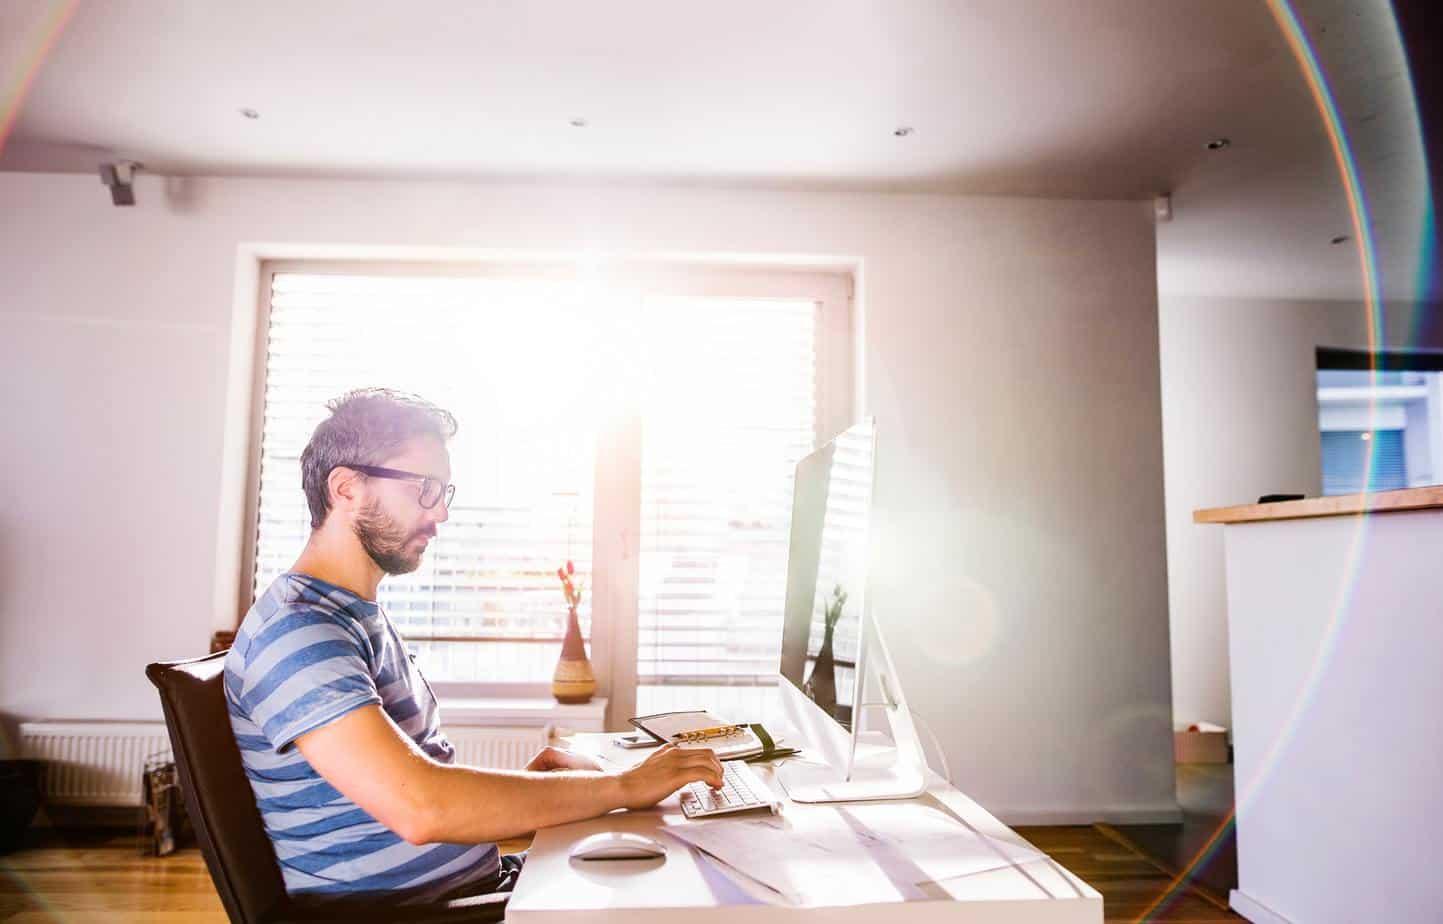 Hörz & Haapamäki man sitting at desk working from home on computer